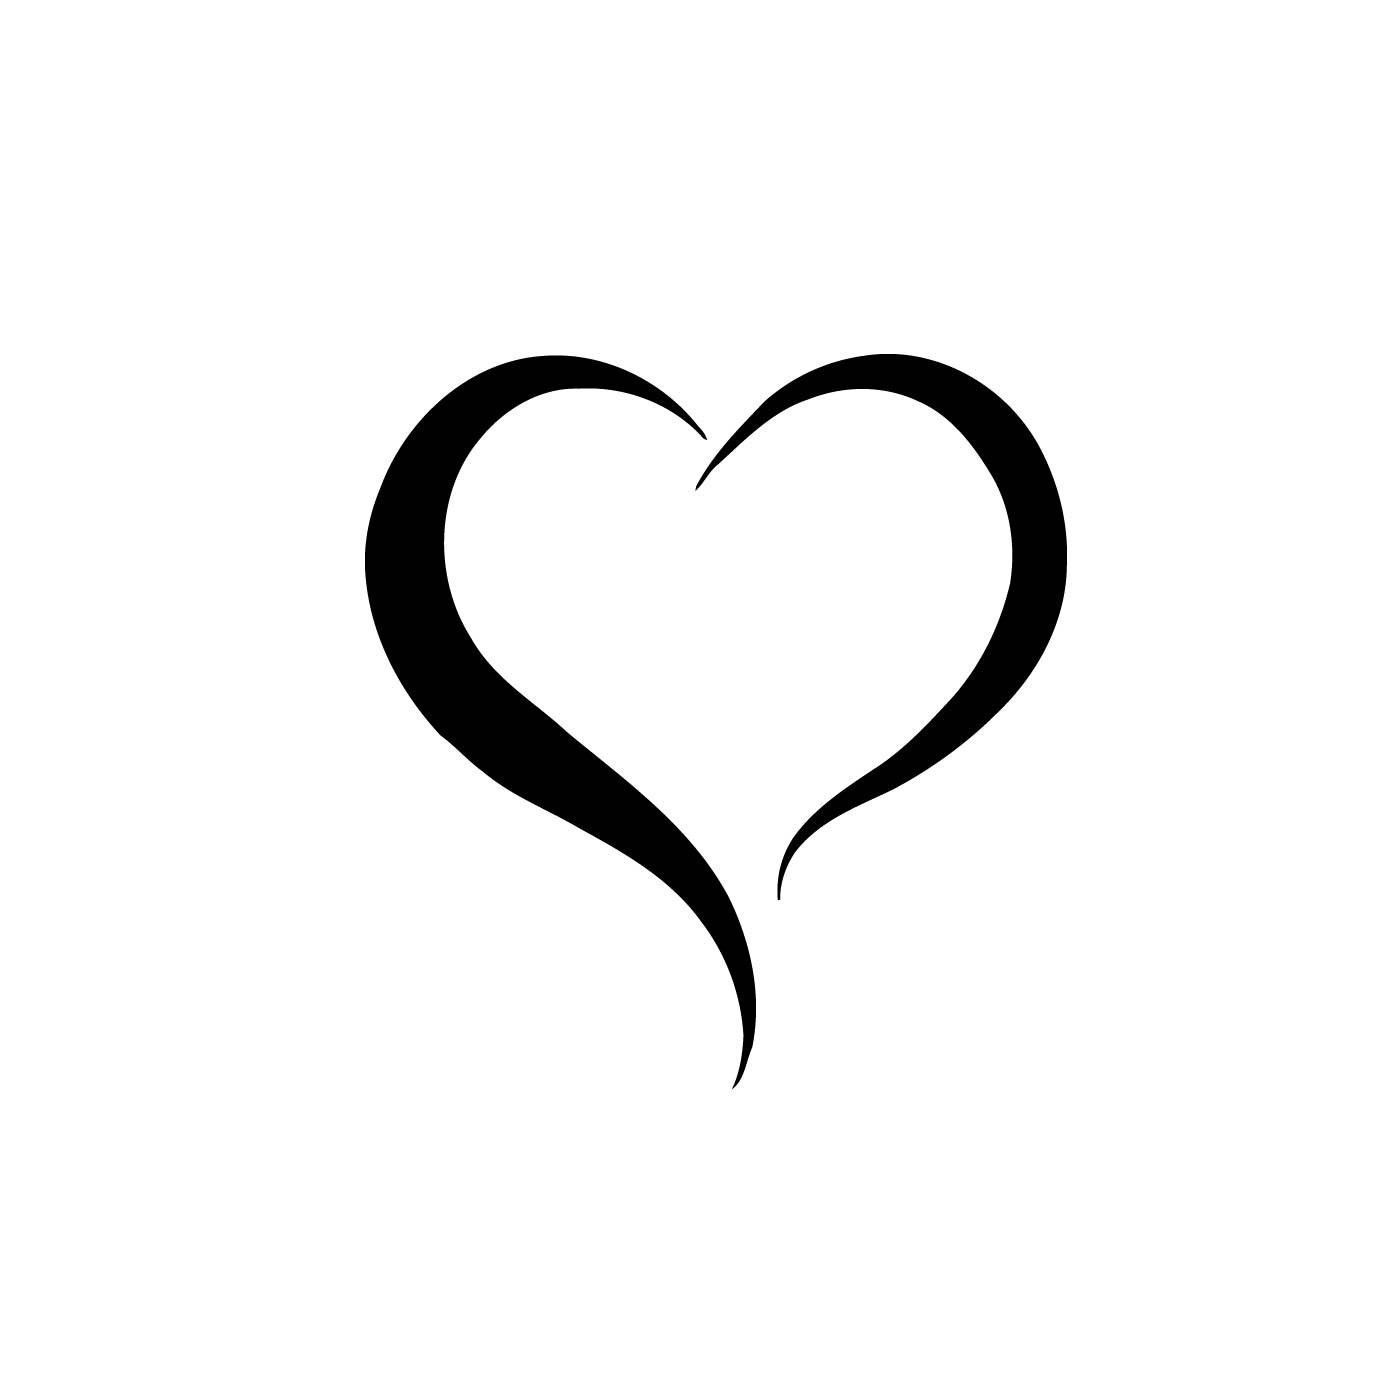 Tattoo Hearts Valentines Day Herz Tattoo